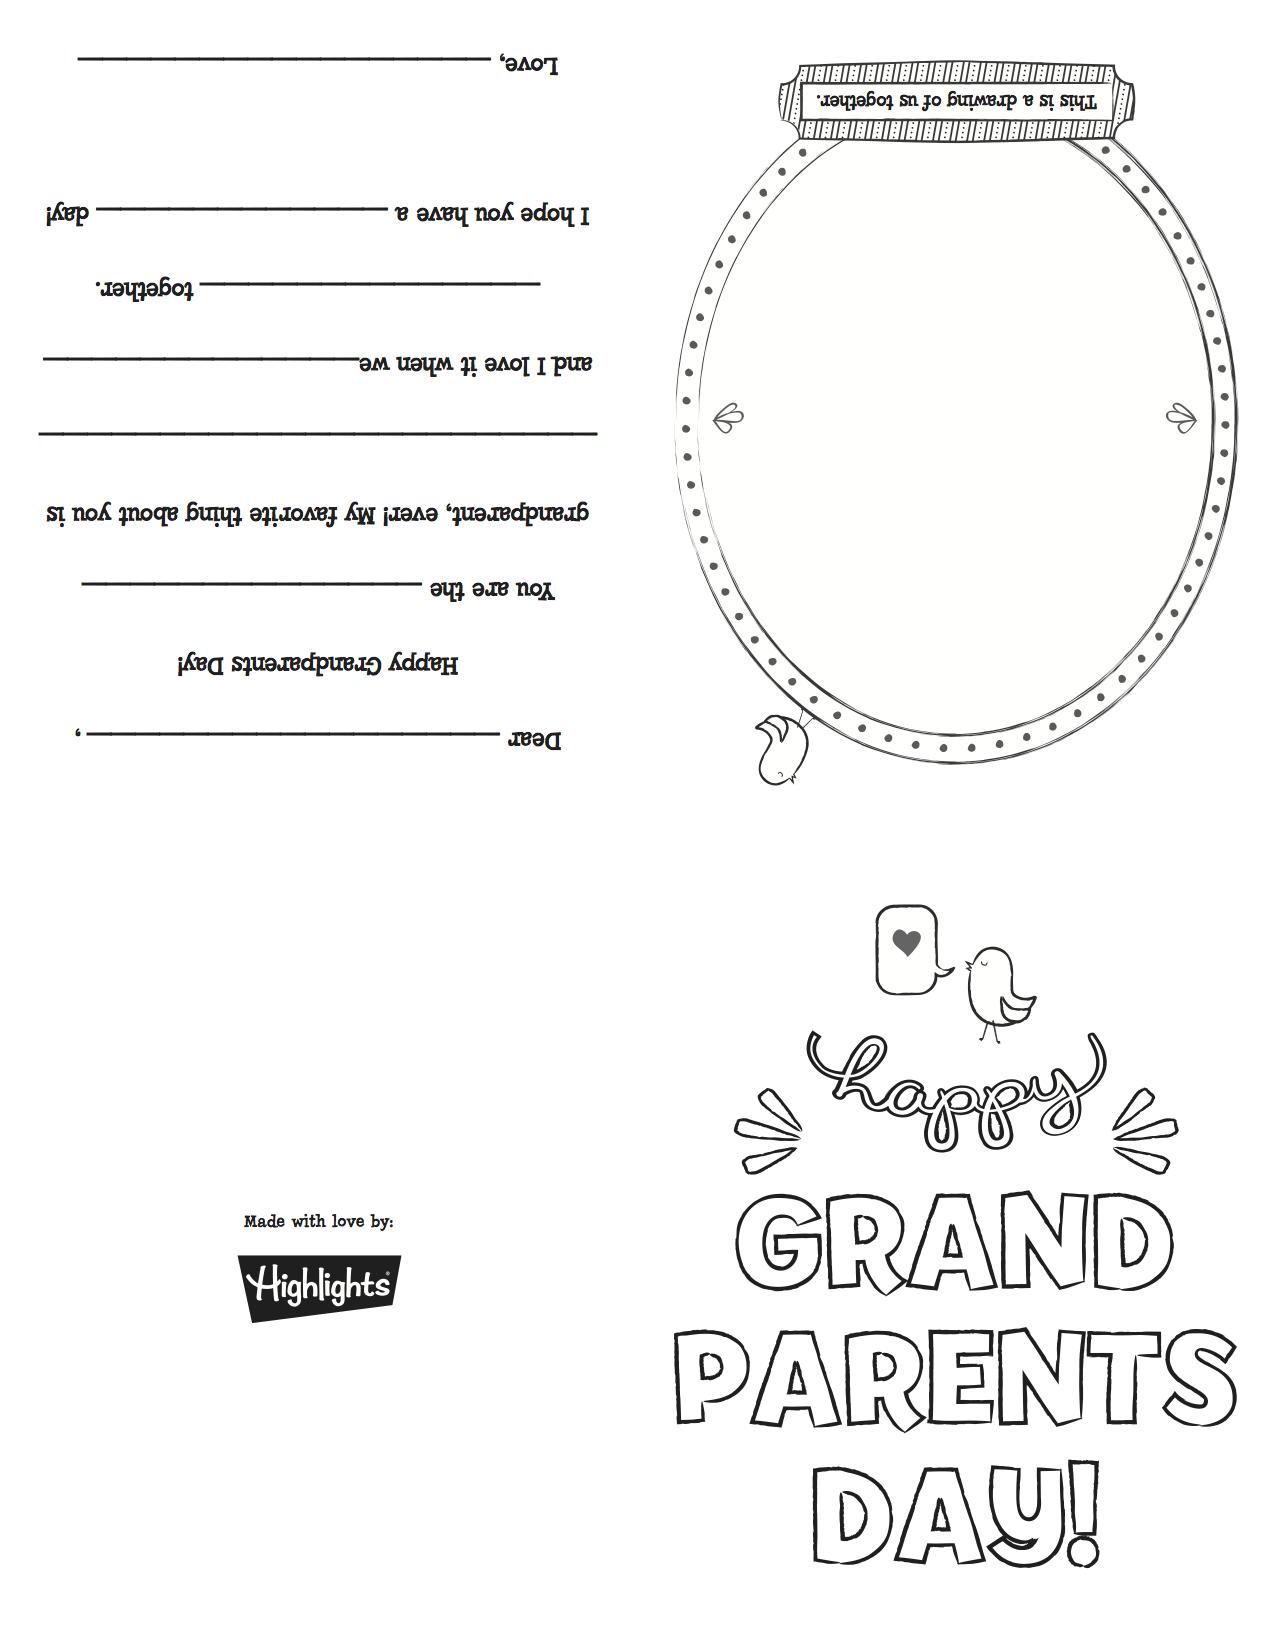 Grandparentsdaycard_Copy   Grandparents Day   Grandparents Day - Grandparents Day Cards Printable Free